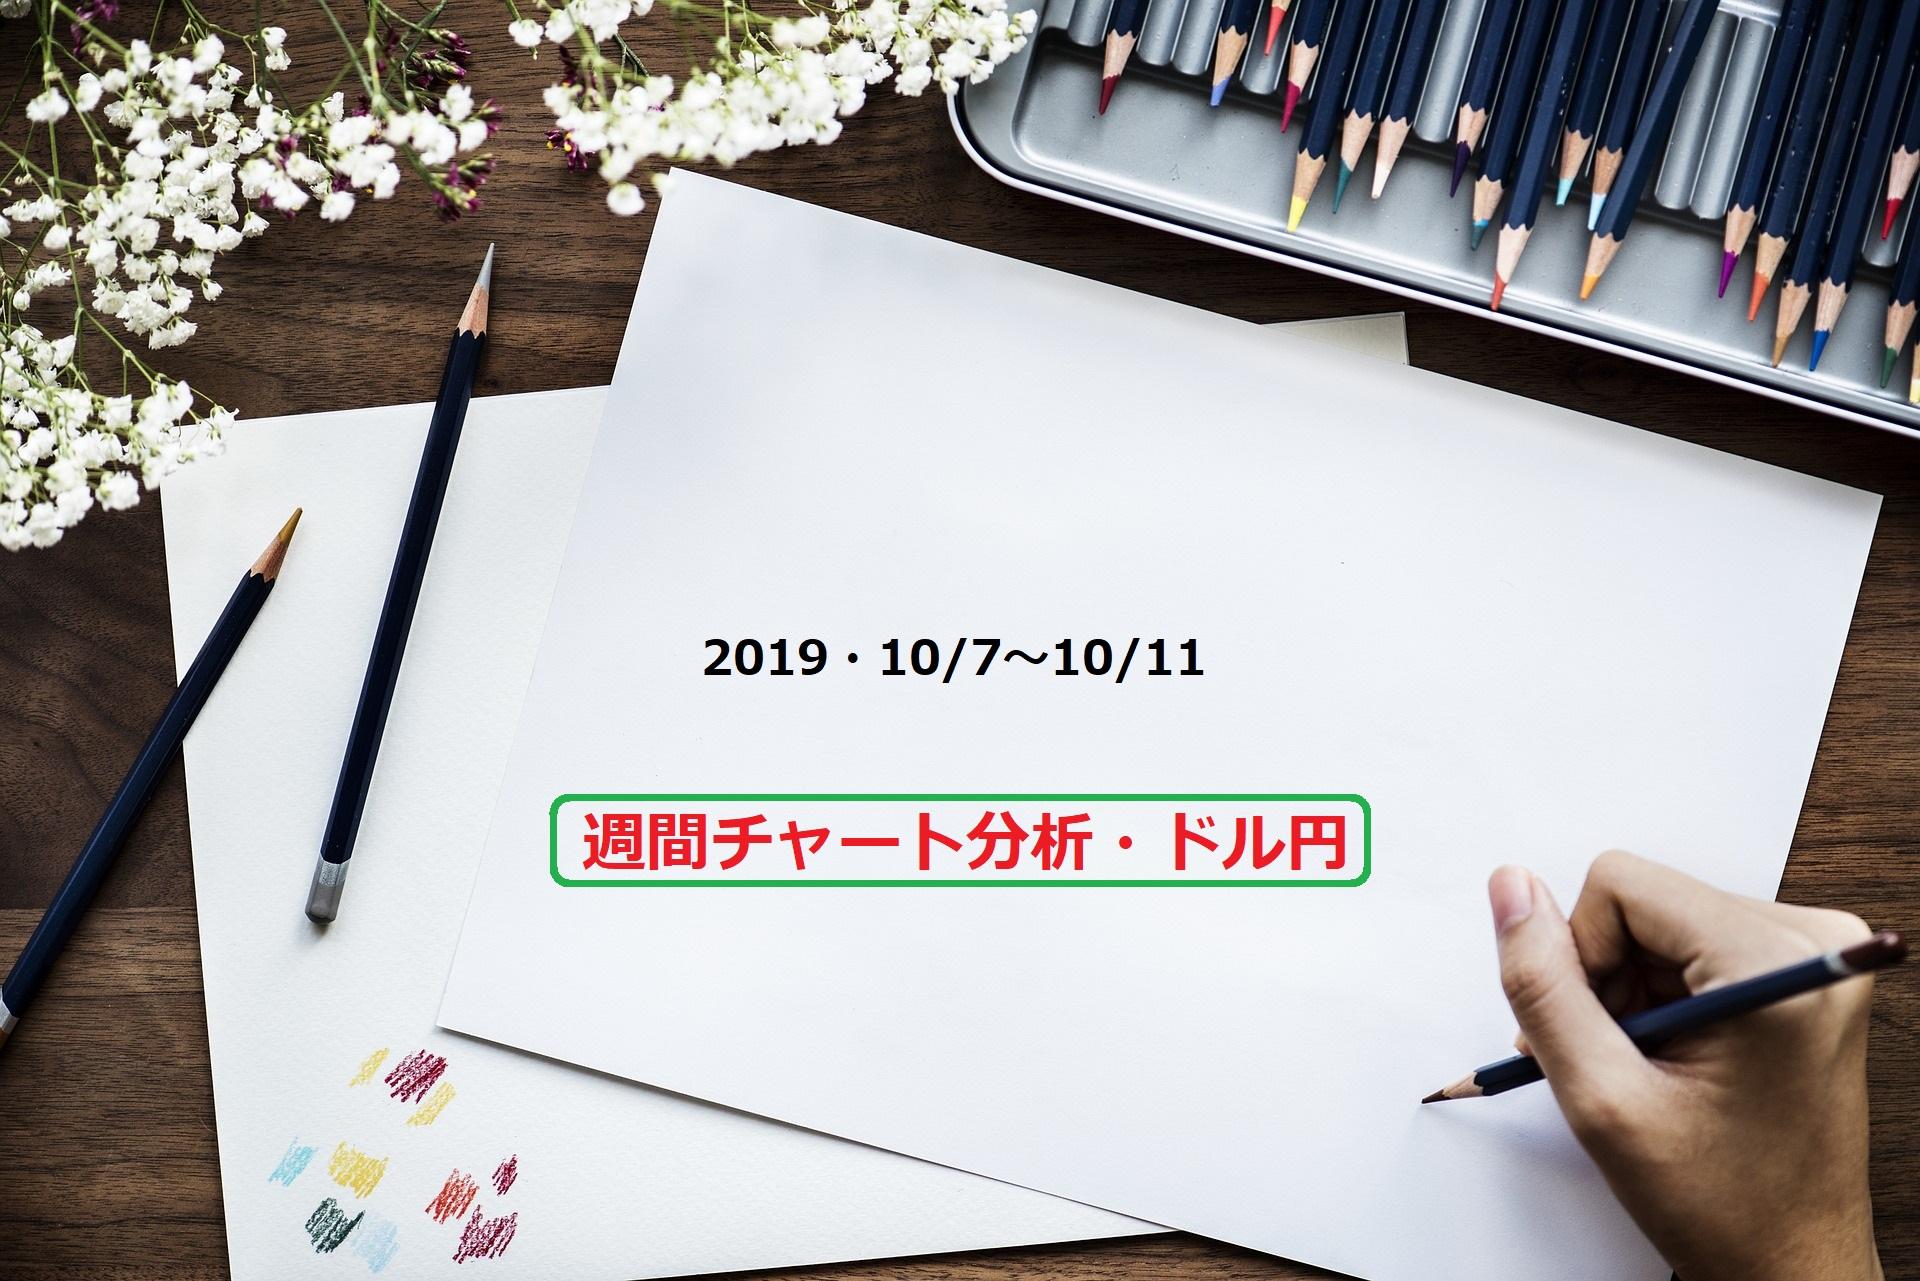 【FX】週間チャート分析・ドル円【2019・10/7~10/11】